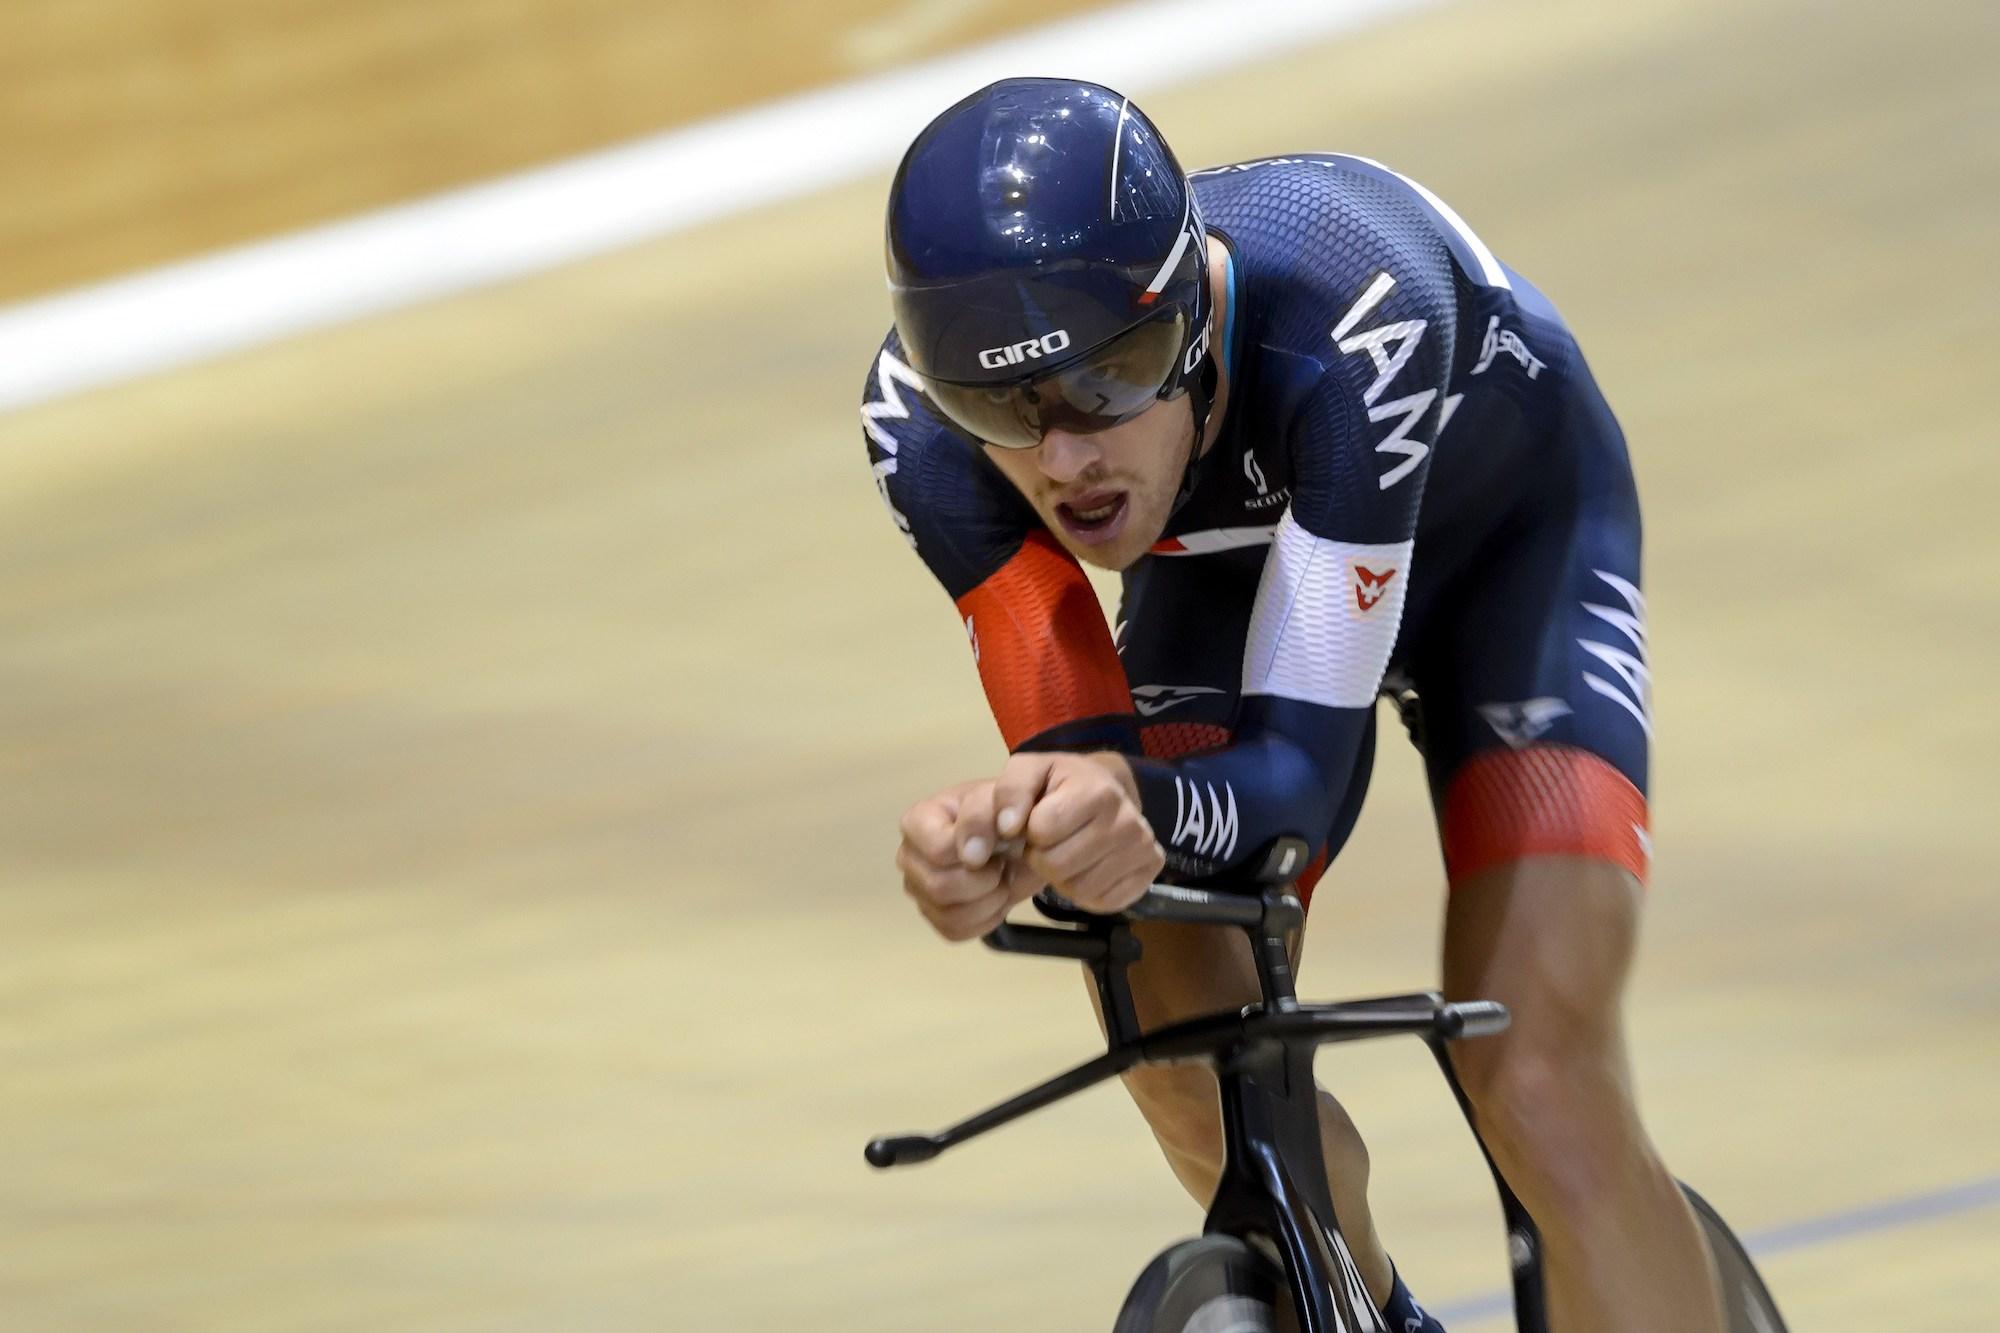 Matthias Brändle considering future attempt on Hour Record